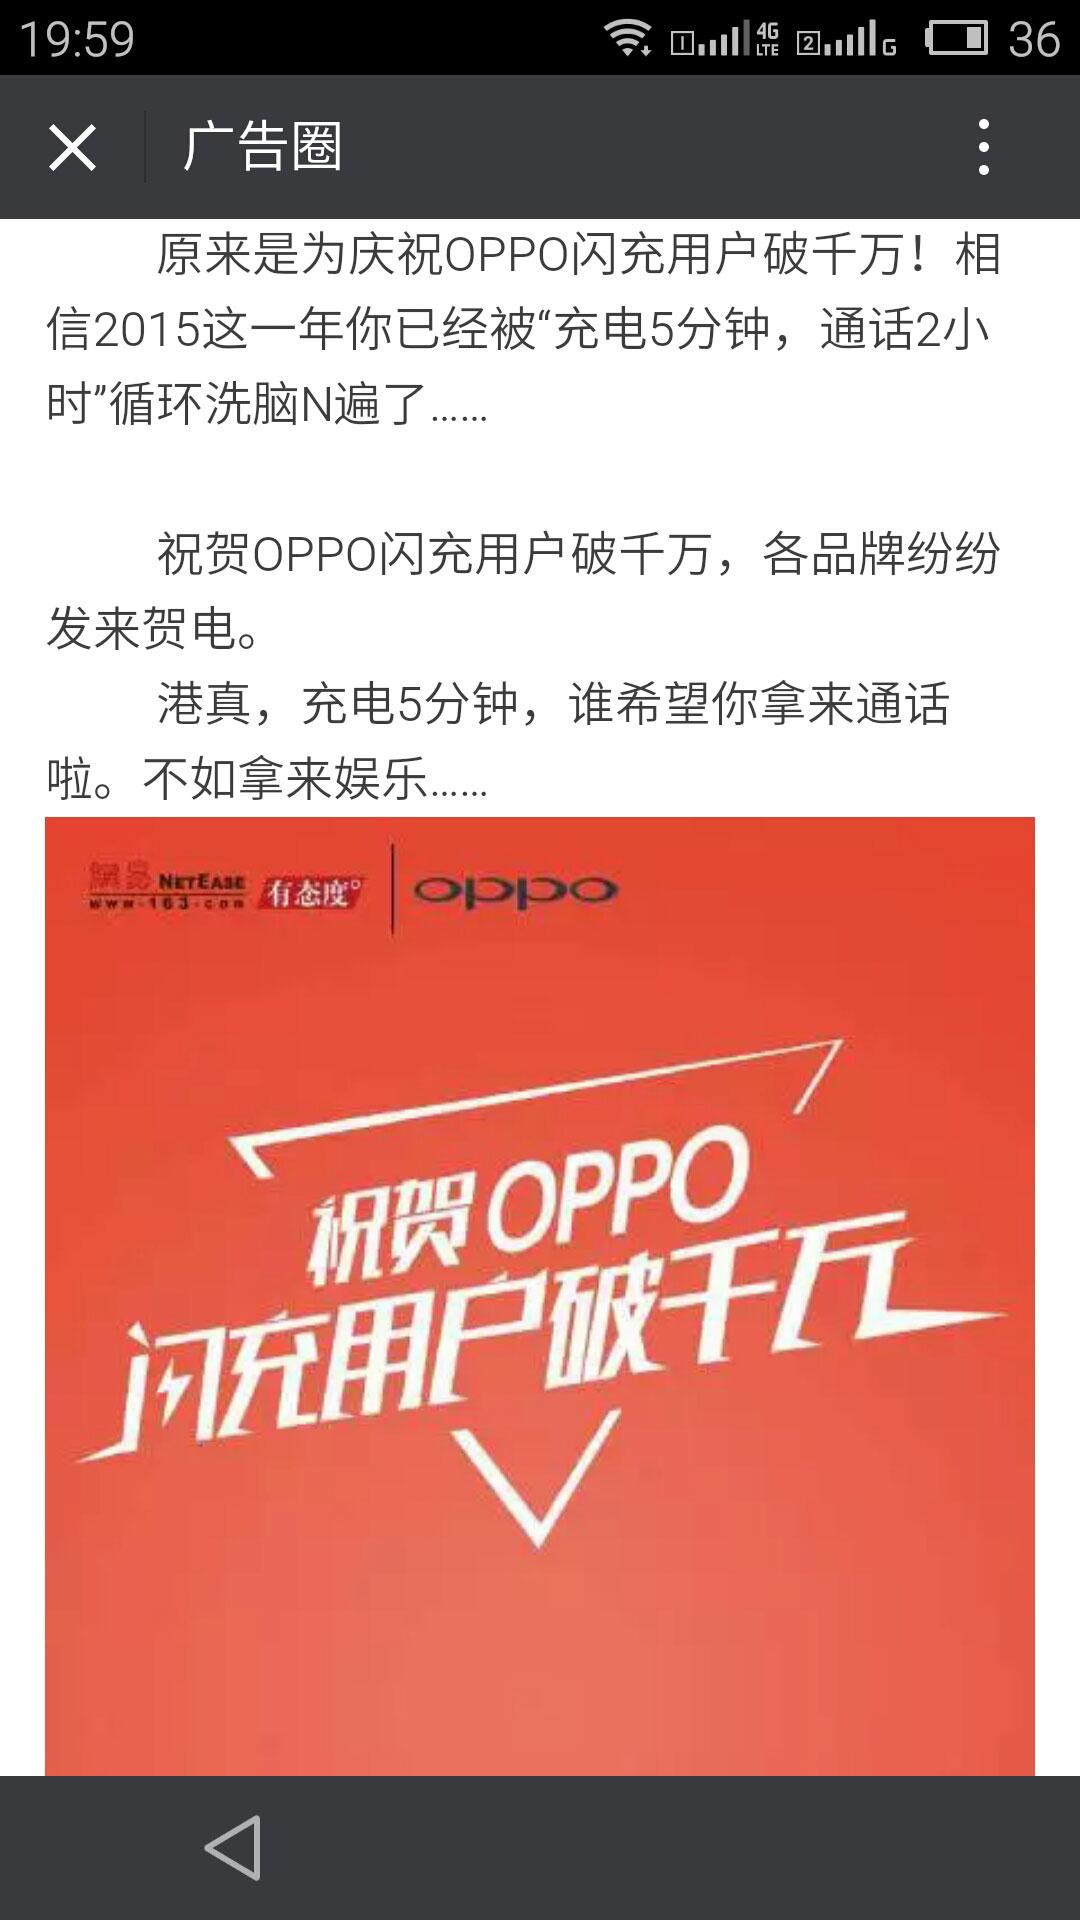 OPPO—智能安卓手机